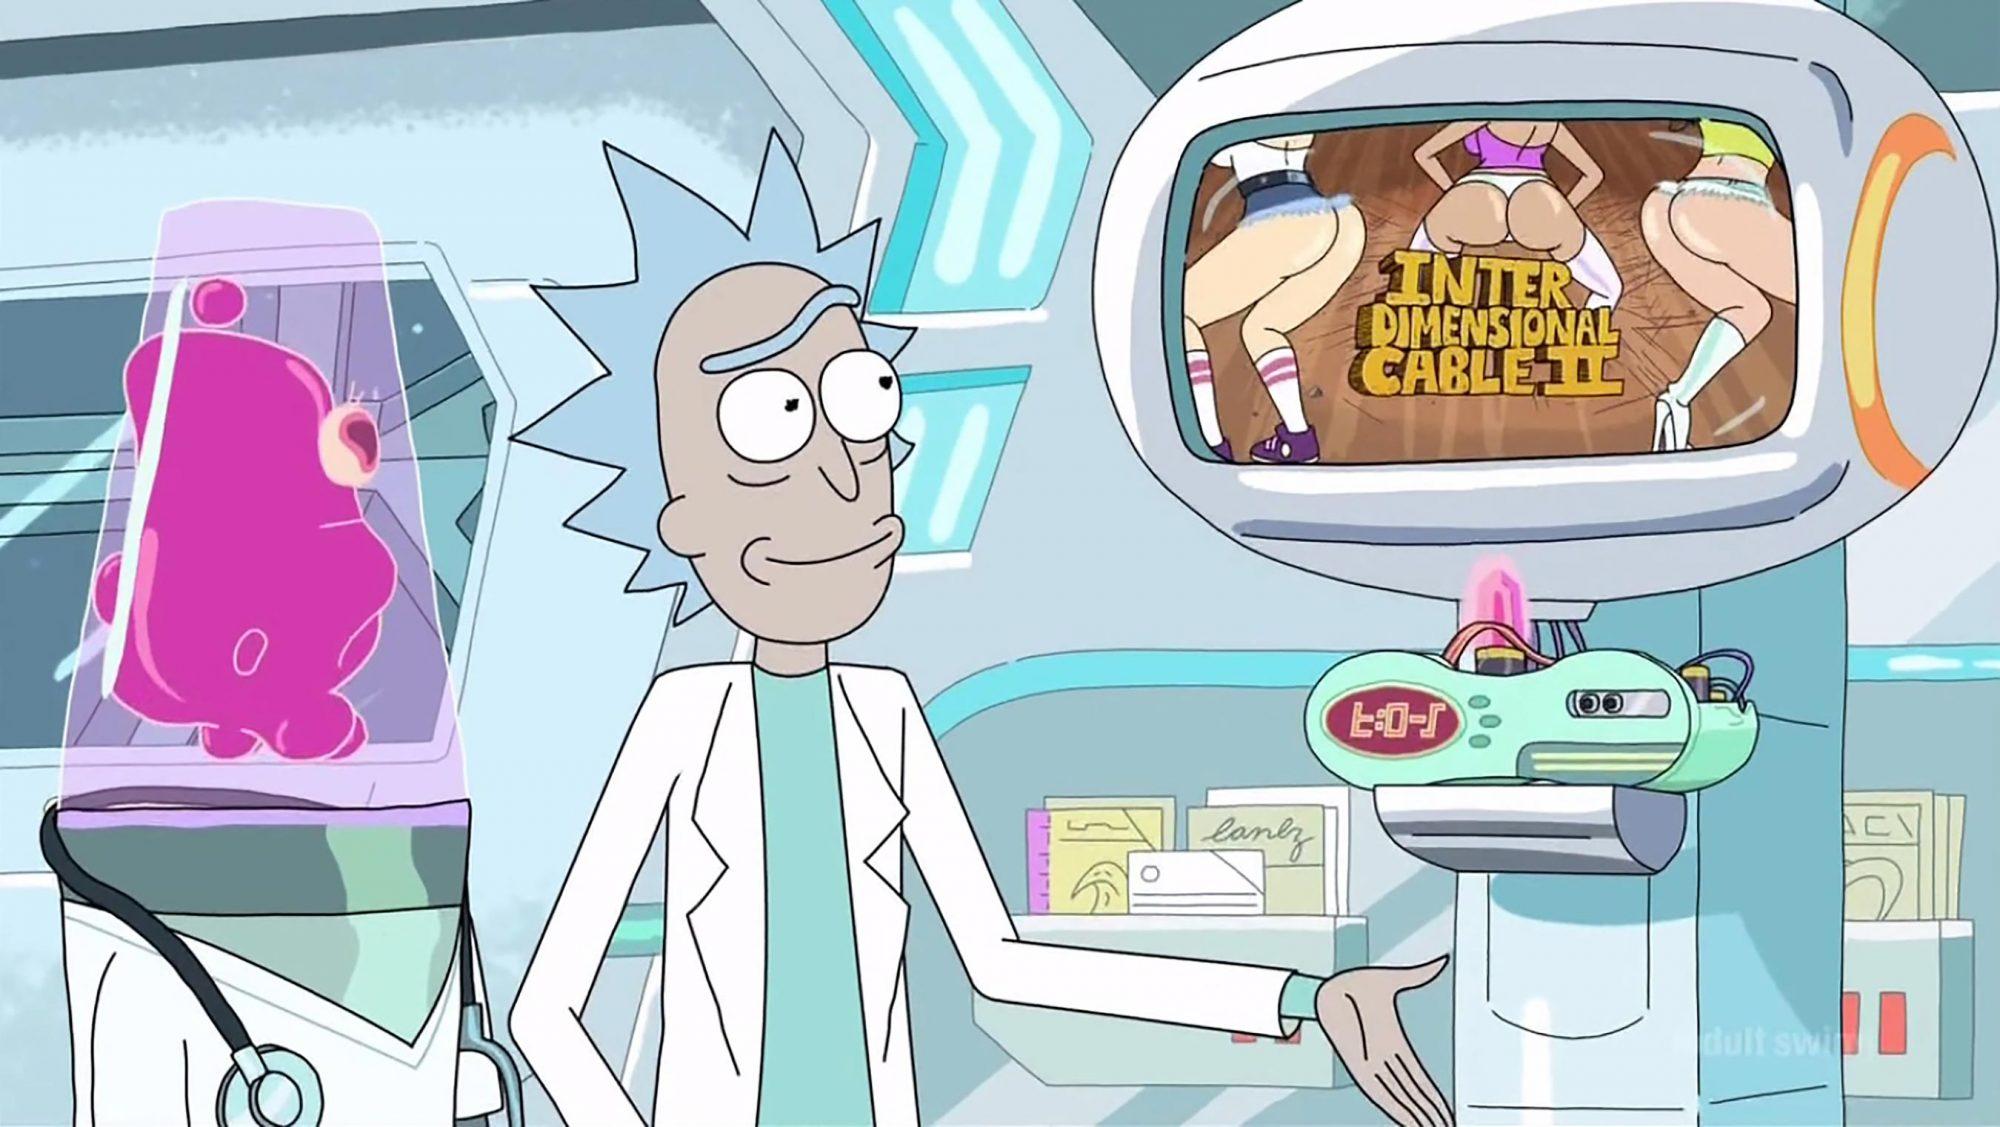 Ricky and Morty - Interdimensional Cable (Season 1, 8;Season 2, Episode 8)